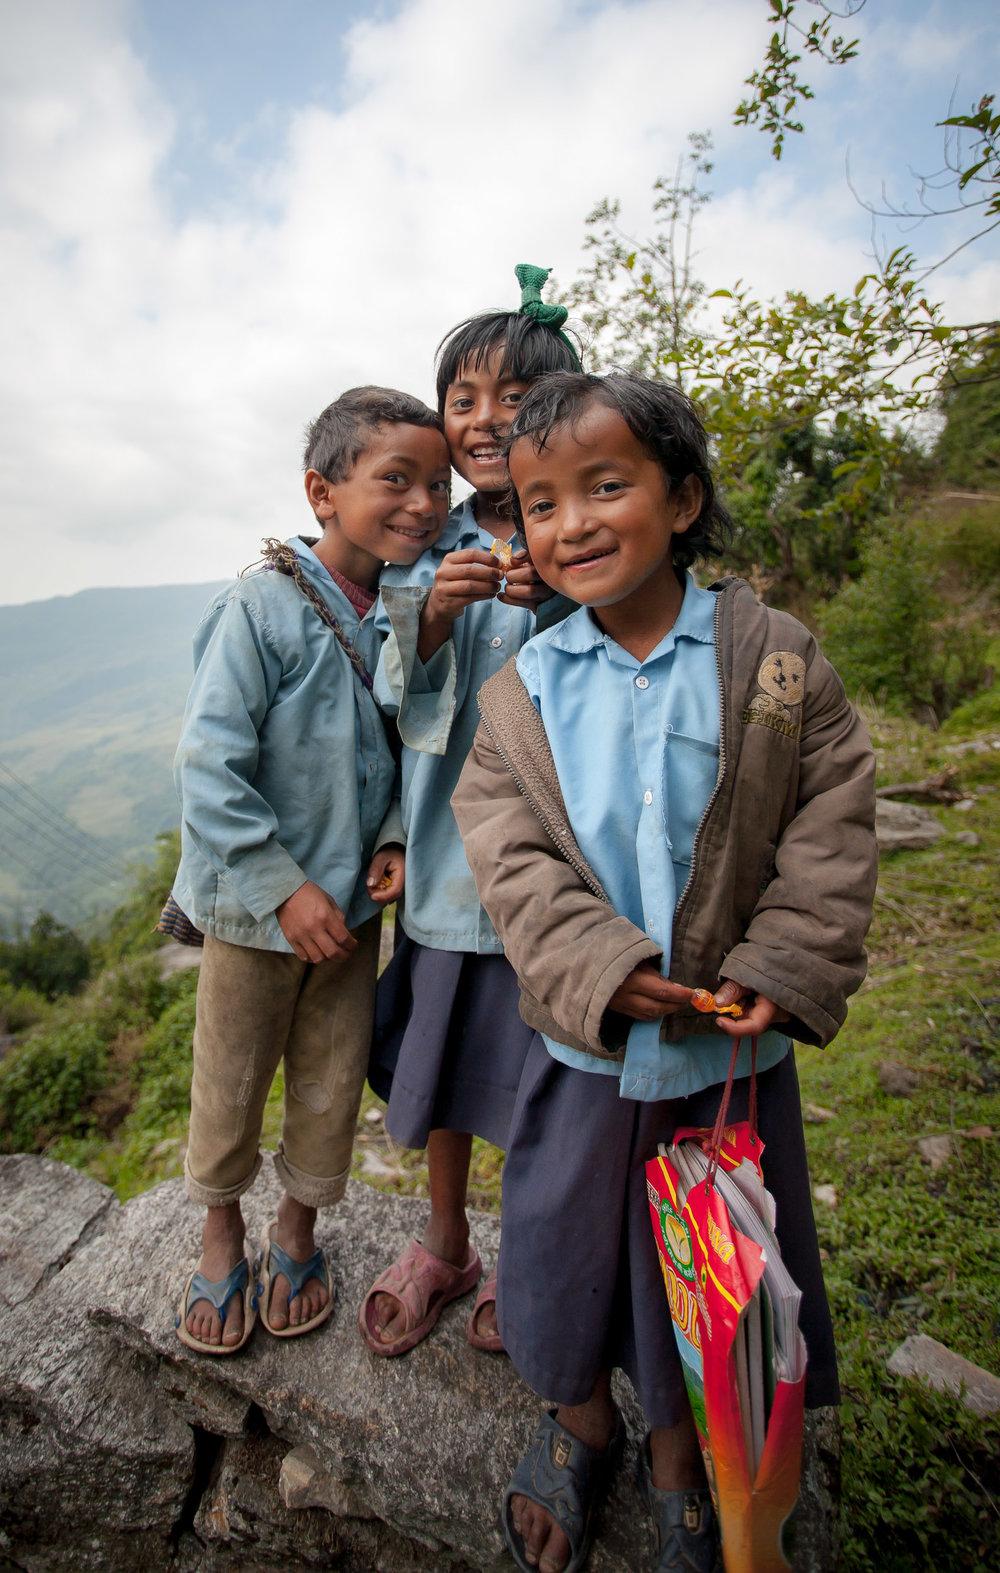 MR_070504_Nepal_308.jpg